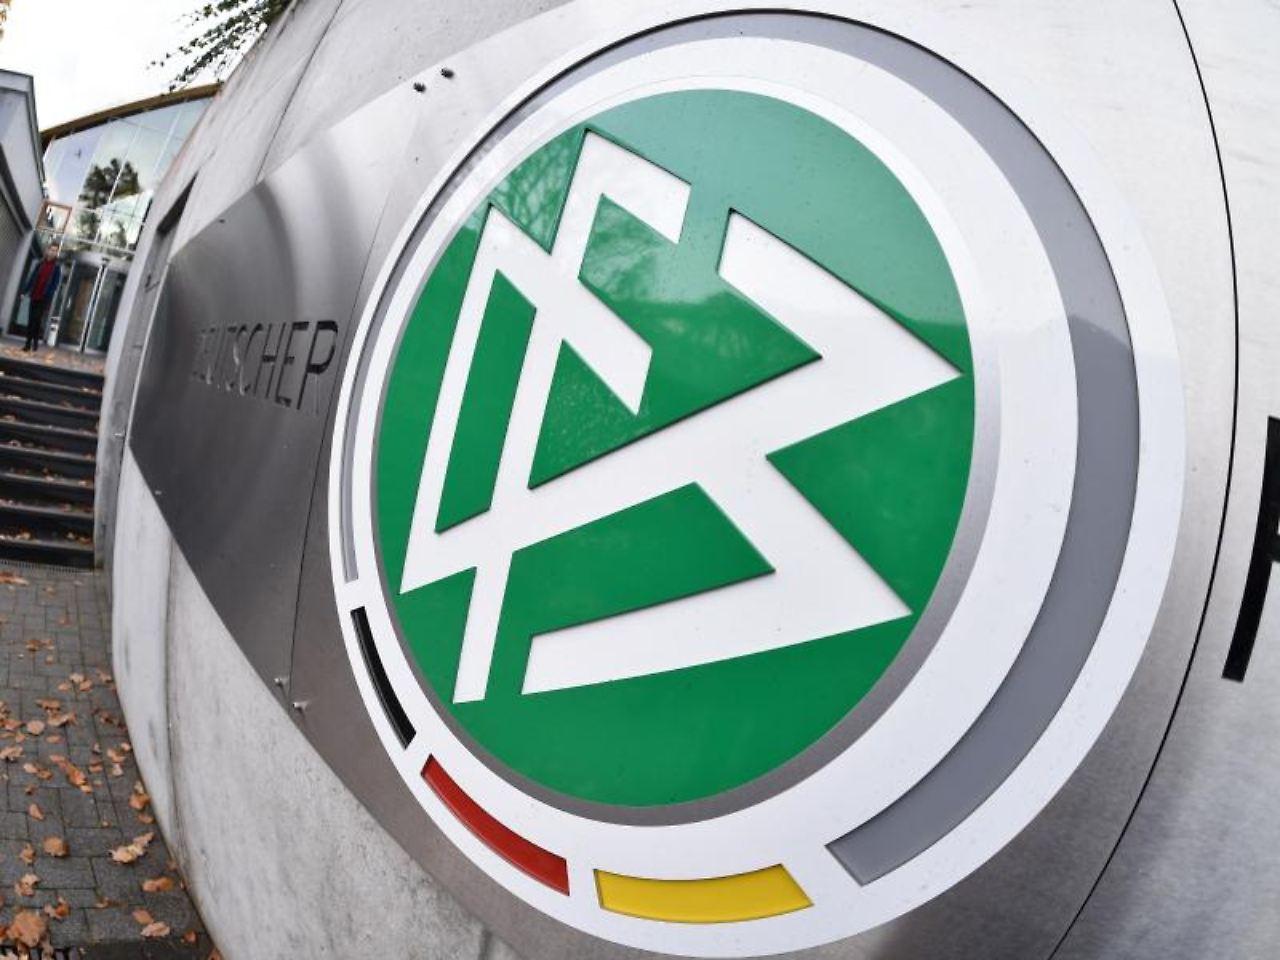 Medien: DFB wechselt den Hauptsponsor - zu VW